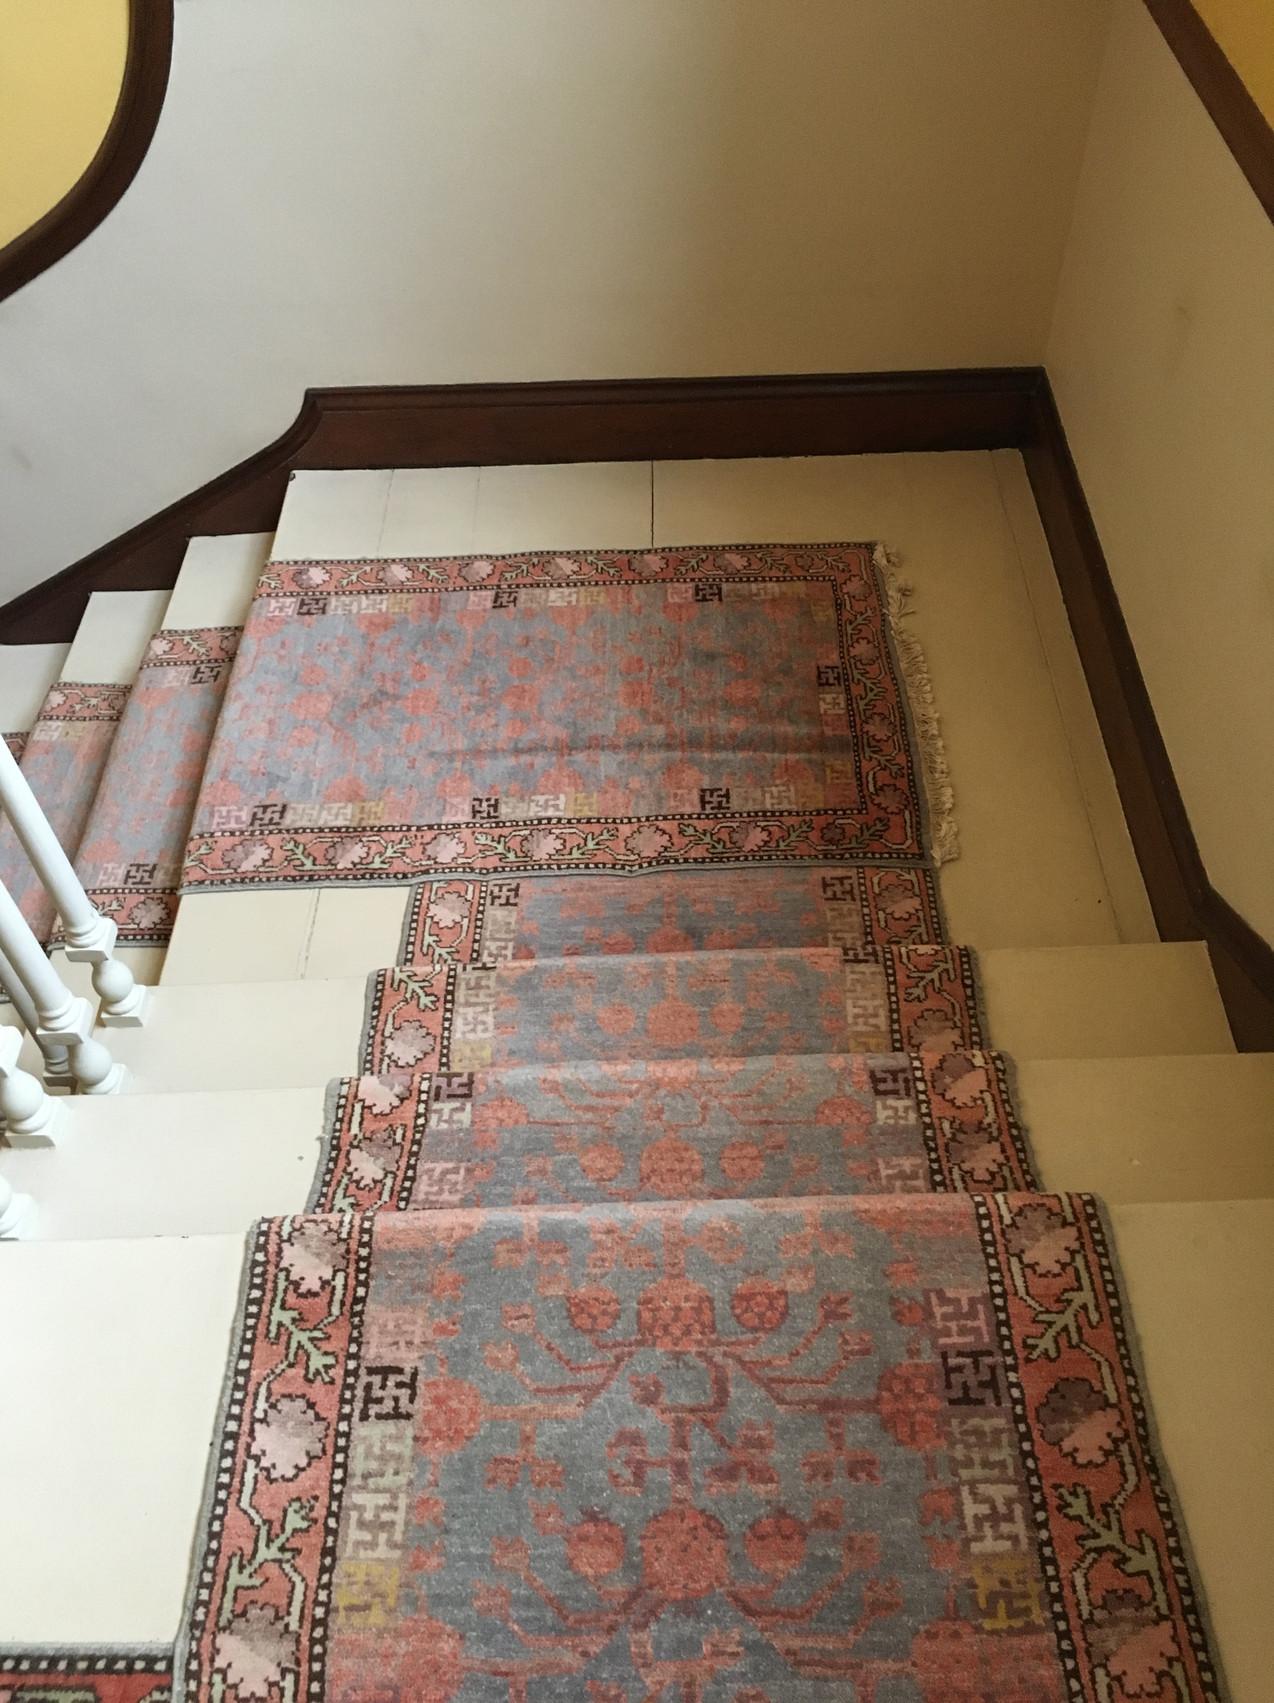 Ardbraccan House stairs